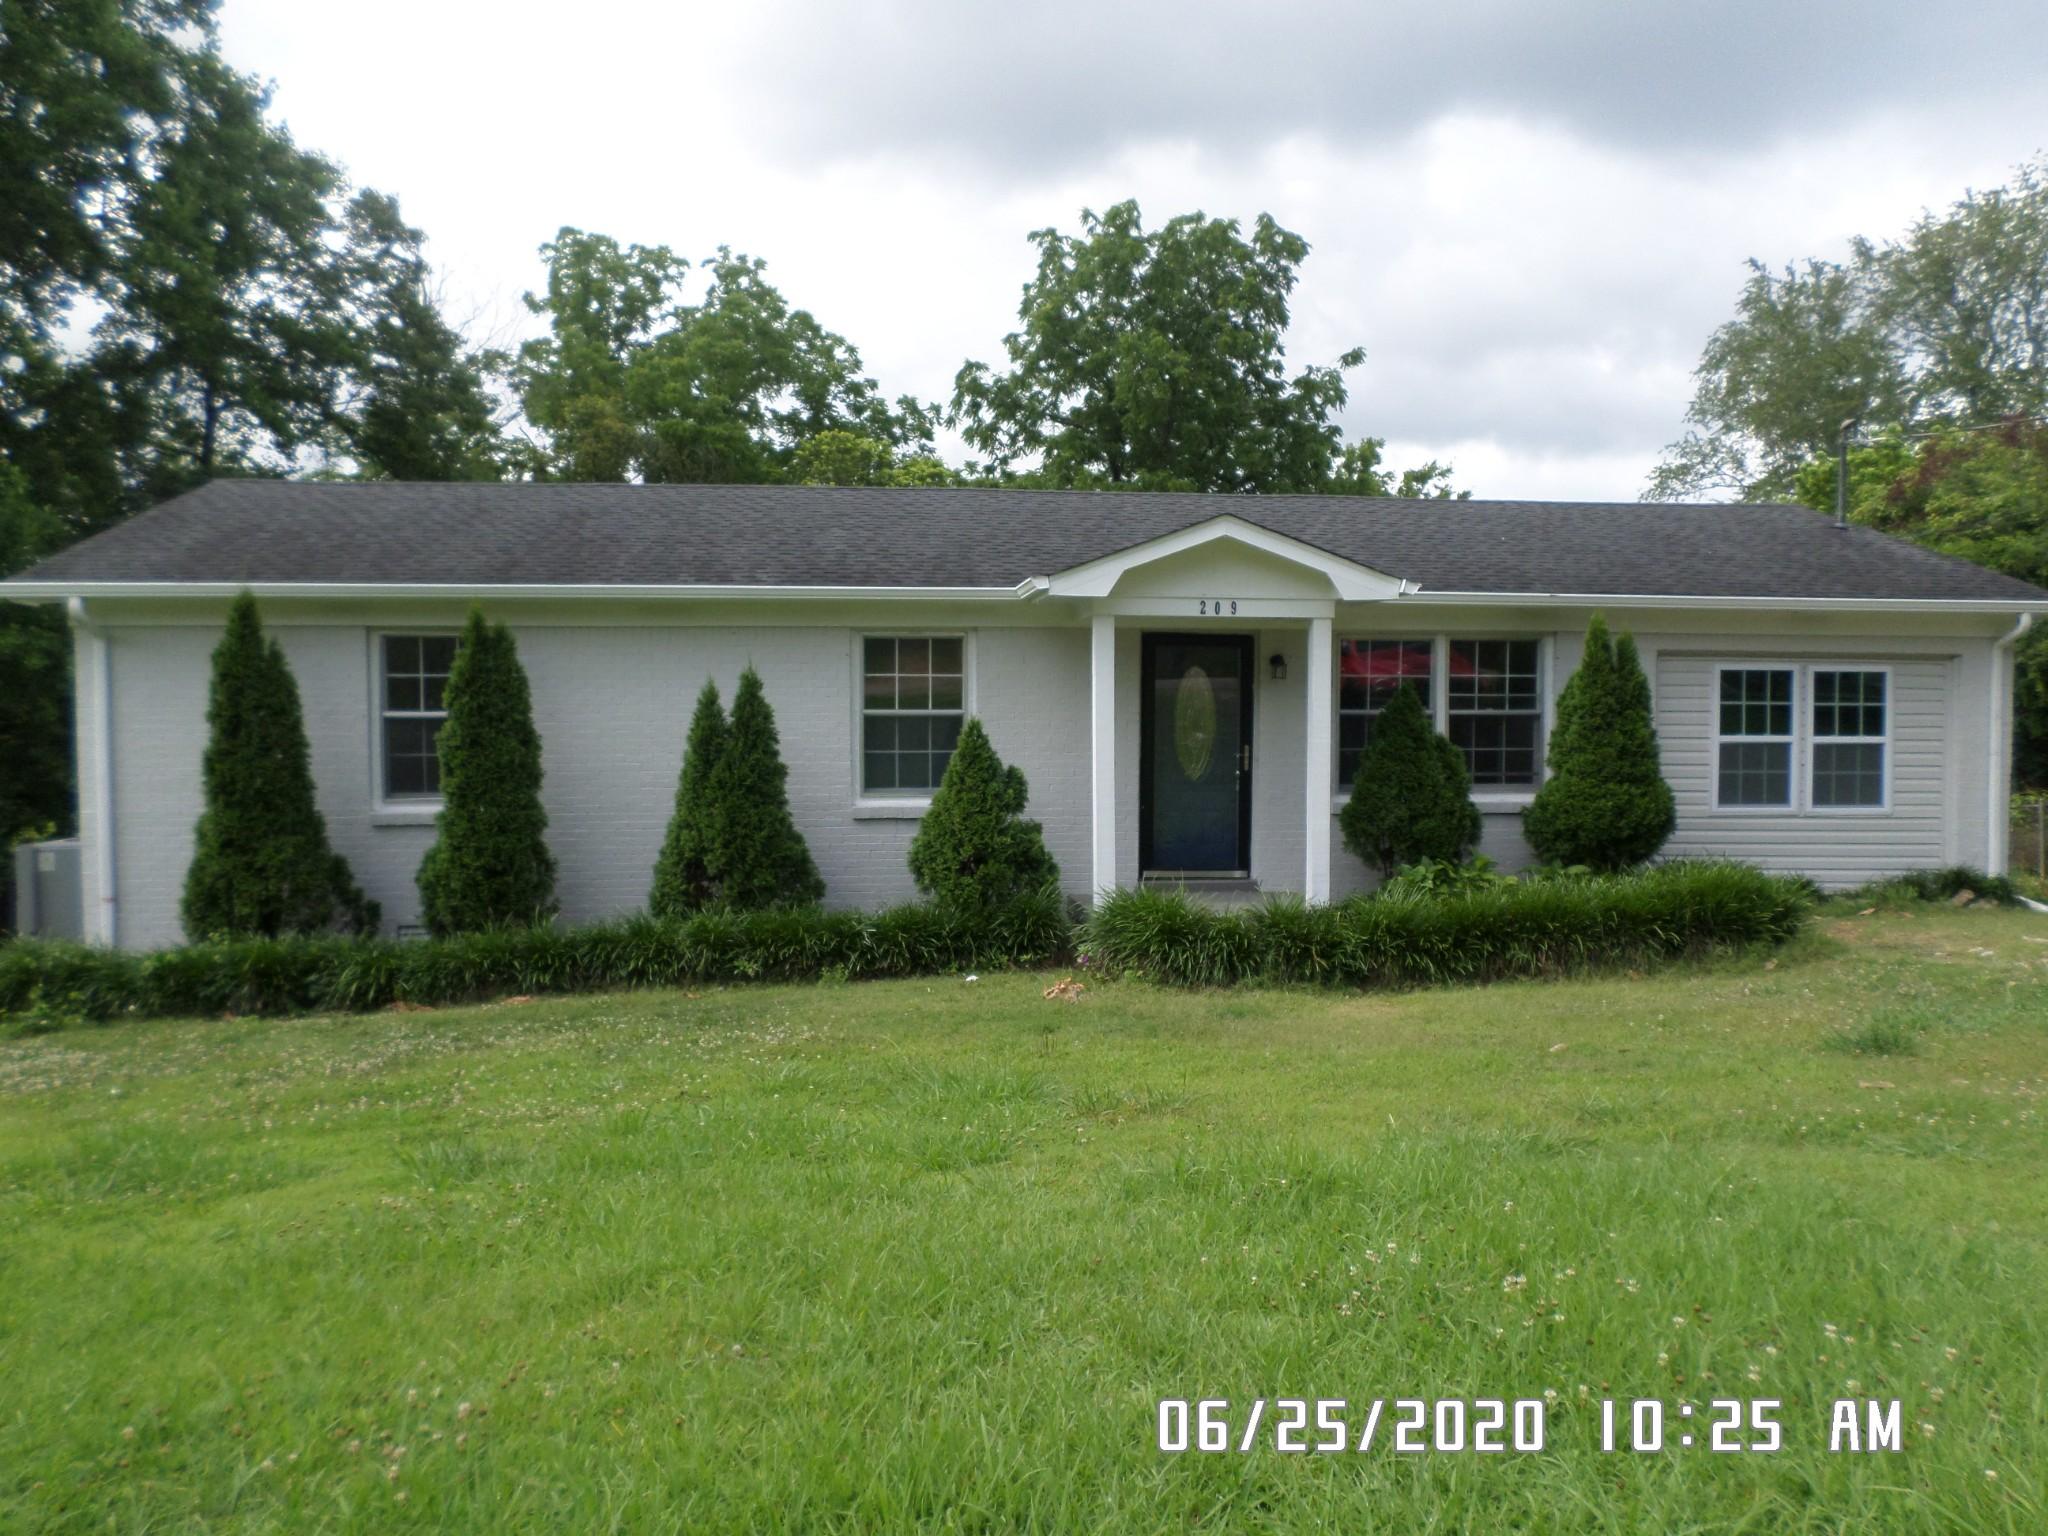 2209 Trotwood Dr Property Photo - Pulaski, TN real estate listing